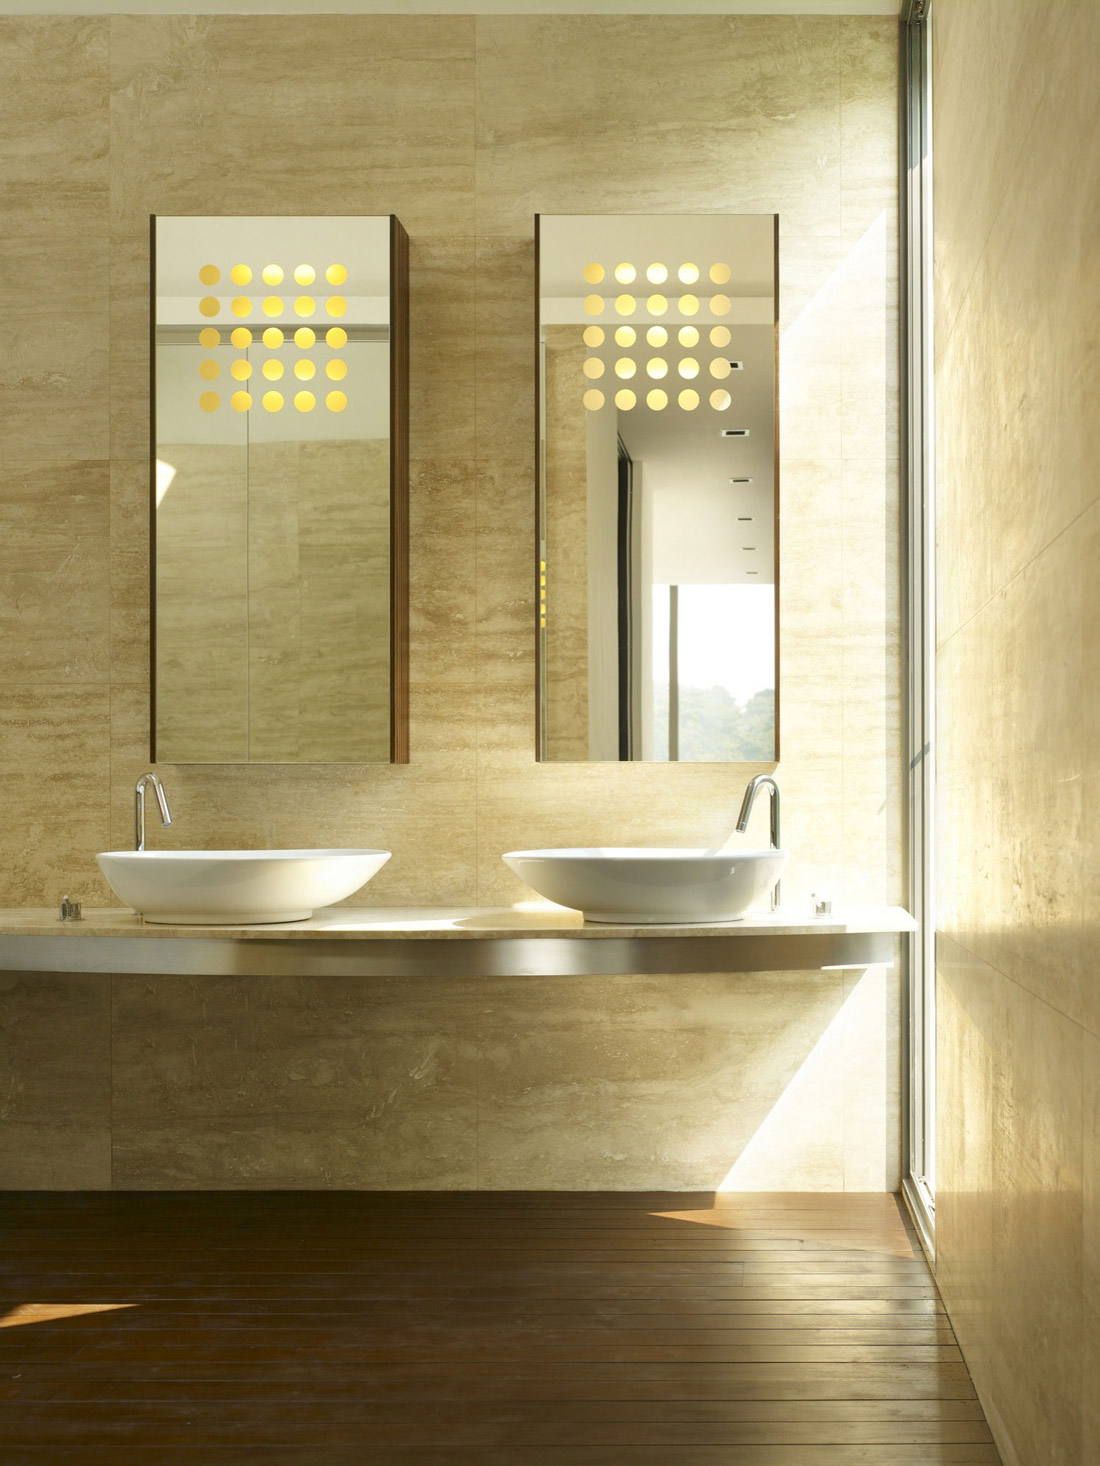 Bathroom, Minimalist Contemporary Home in Singapore